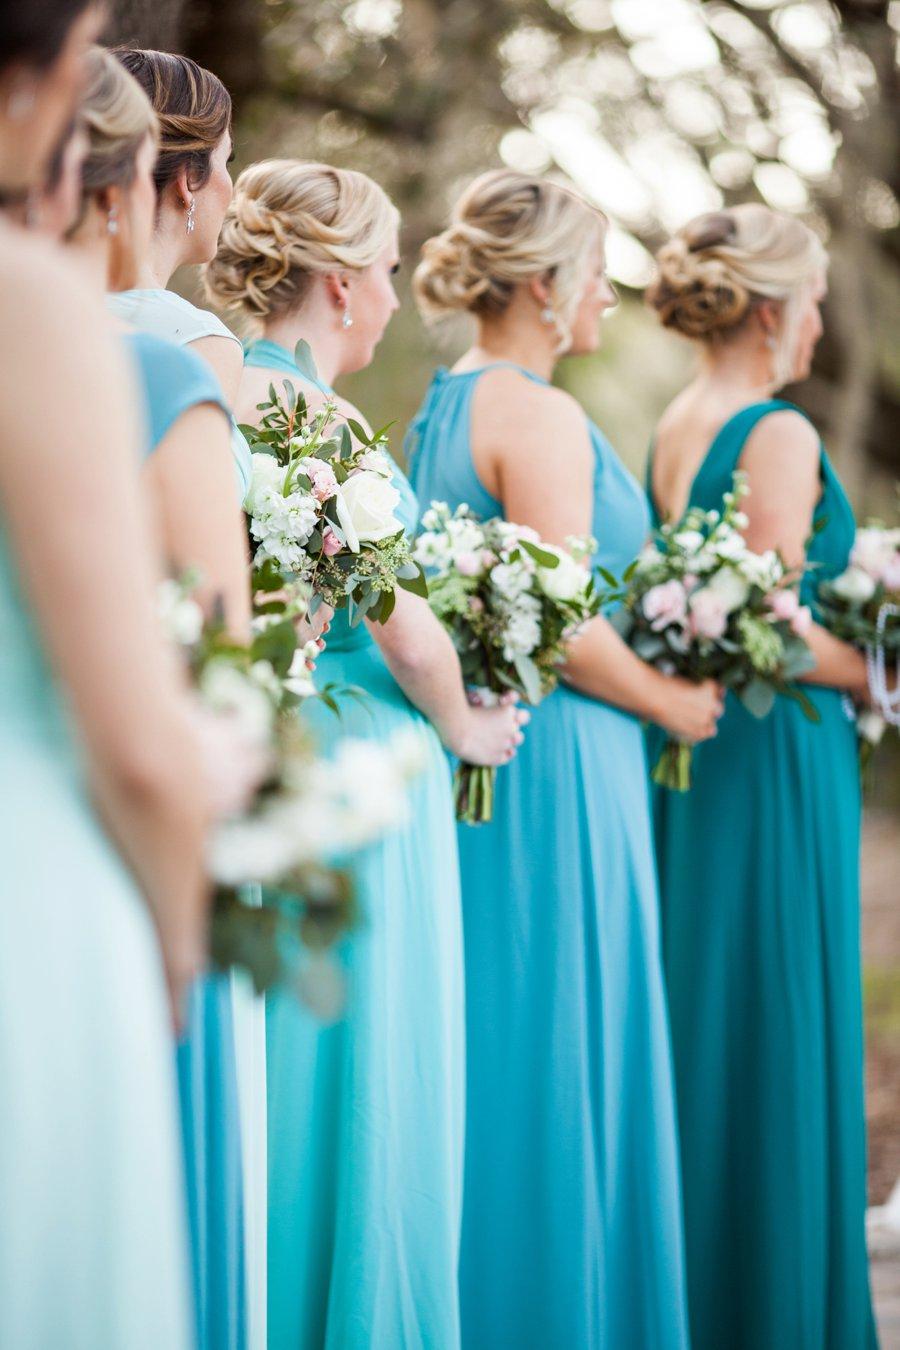 A Pink and Teal Rustic Florida Wedding via TheELD.com